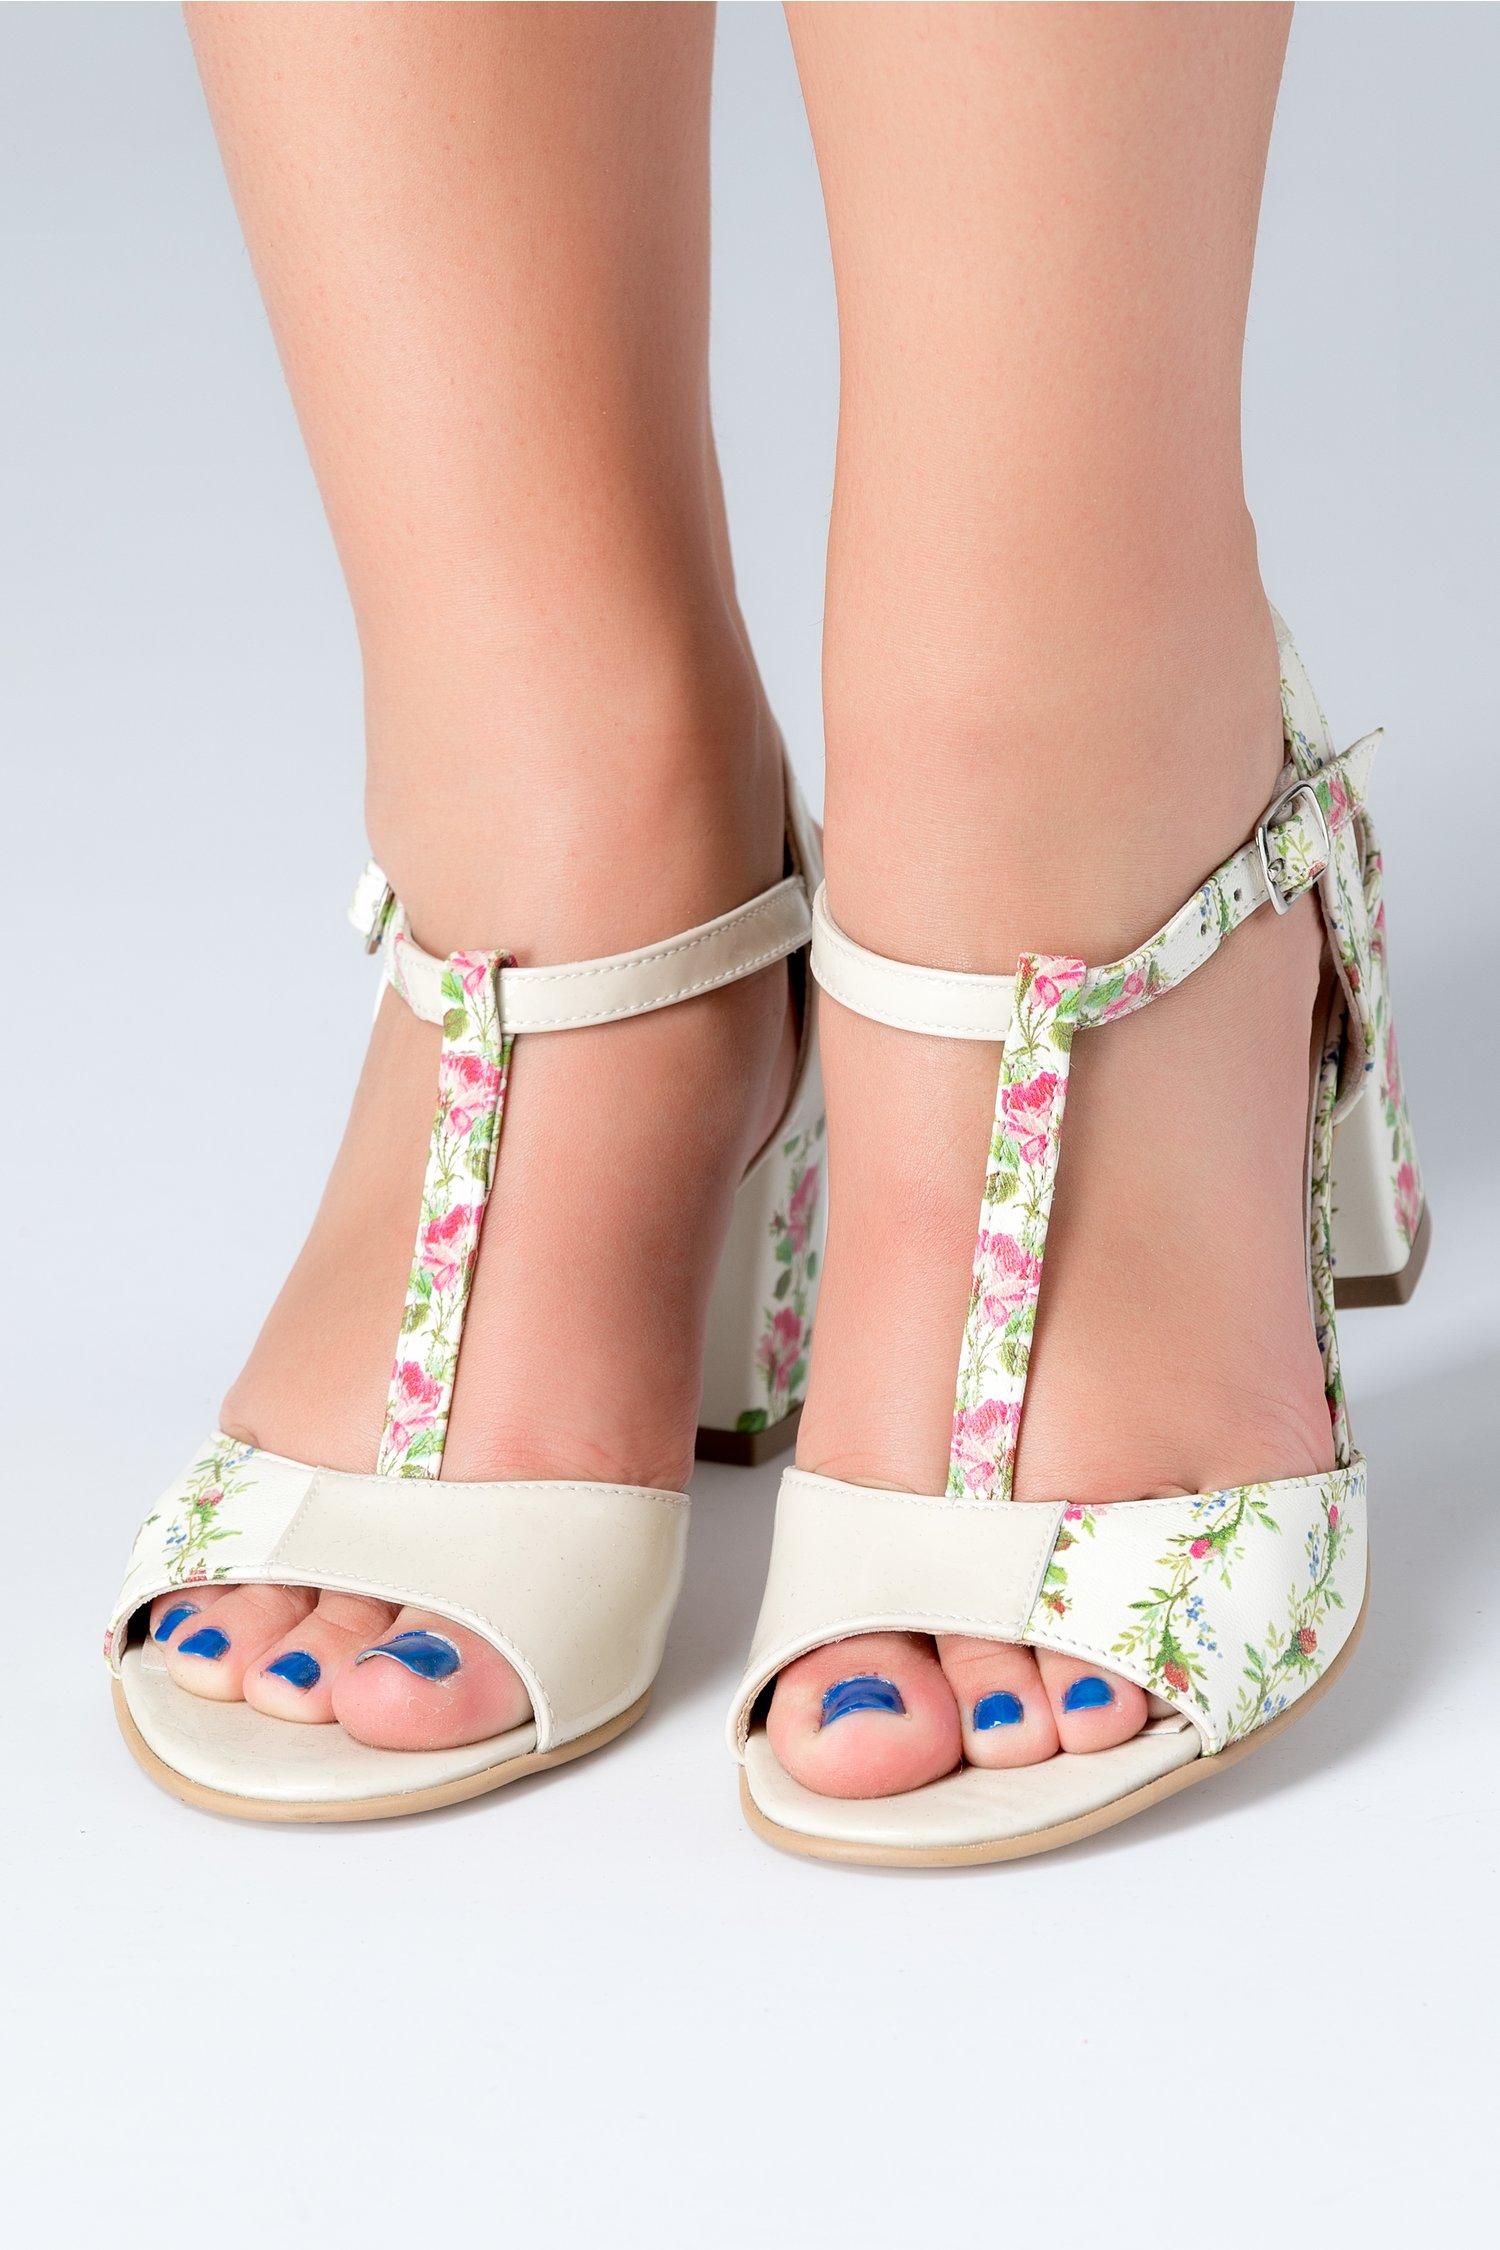 Sandale ivory cu bareta si motive florale